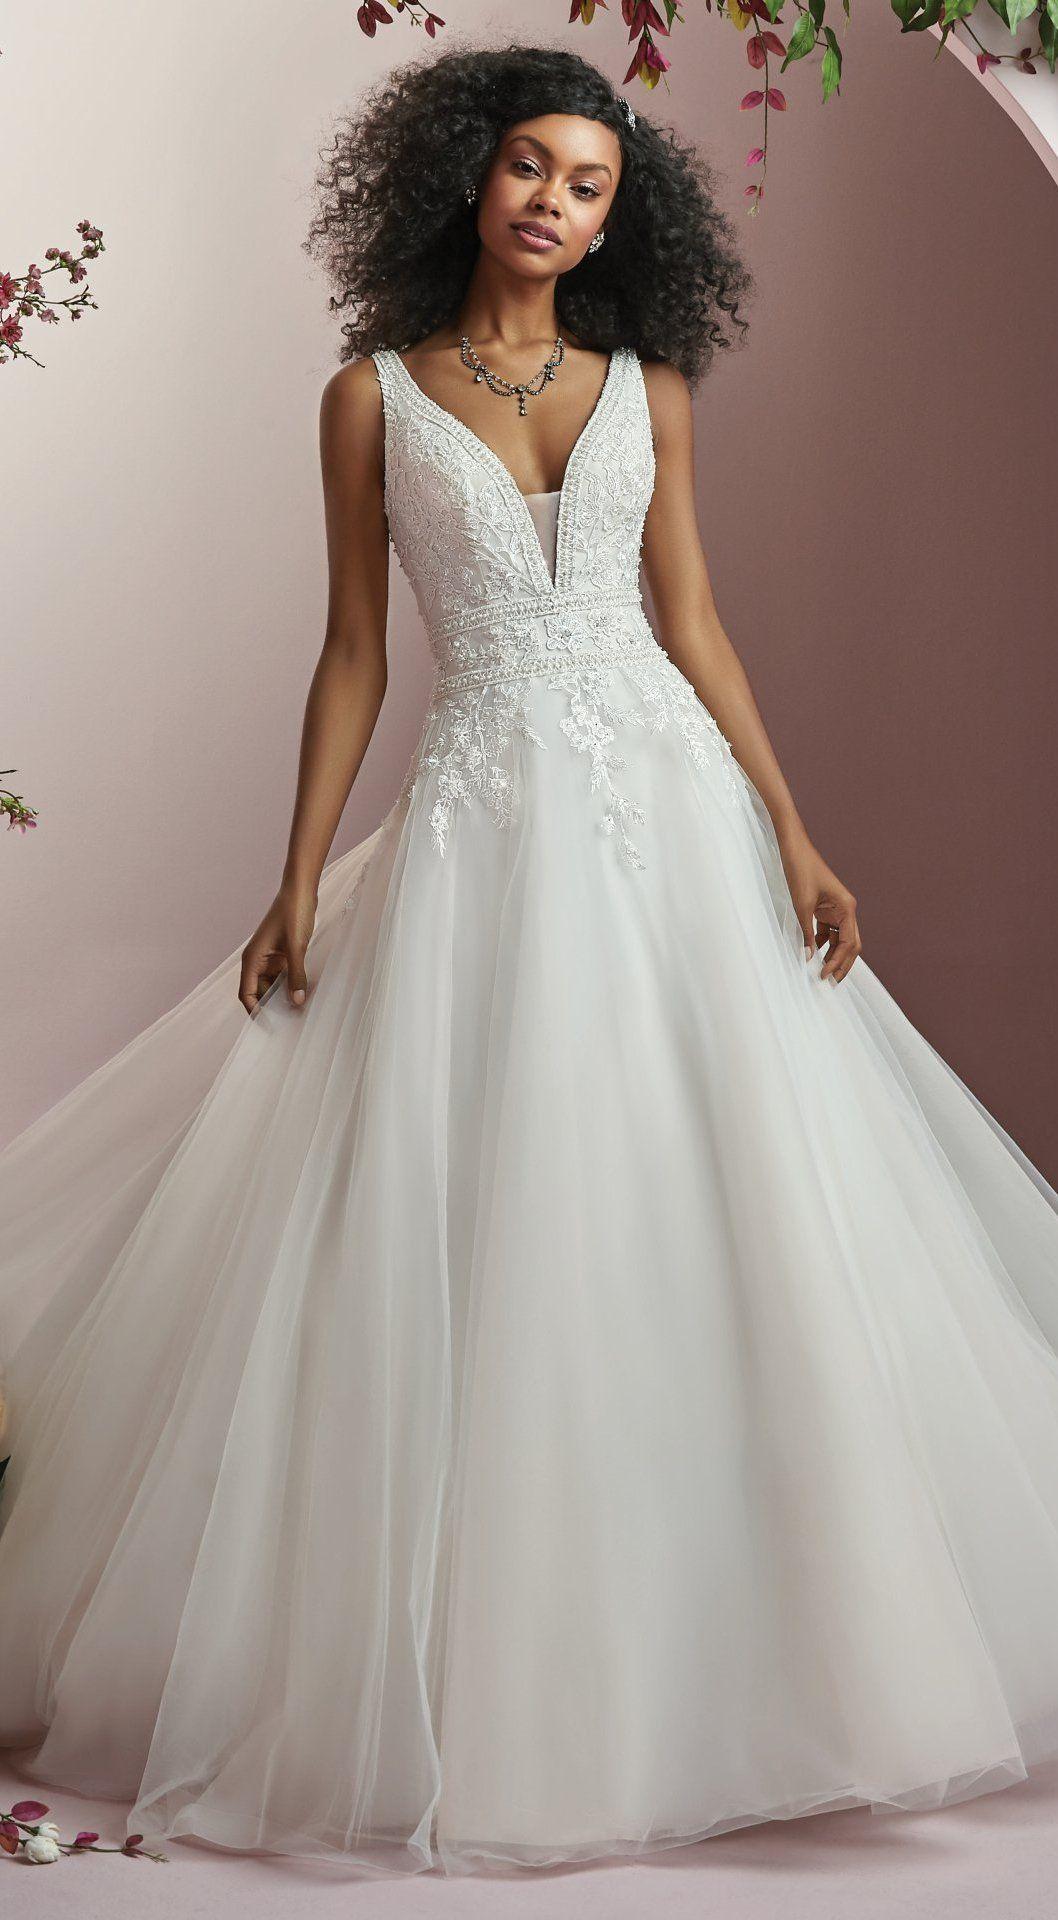 Wynona By Rebecca Ingram Wedding Dresses In 2020 Wedding Dresses